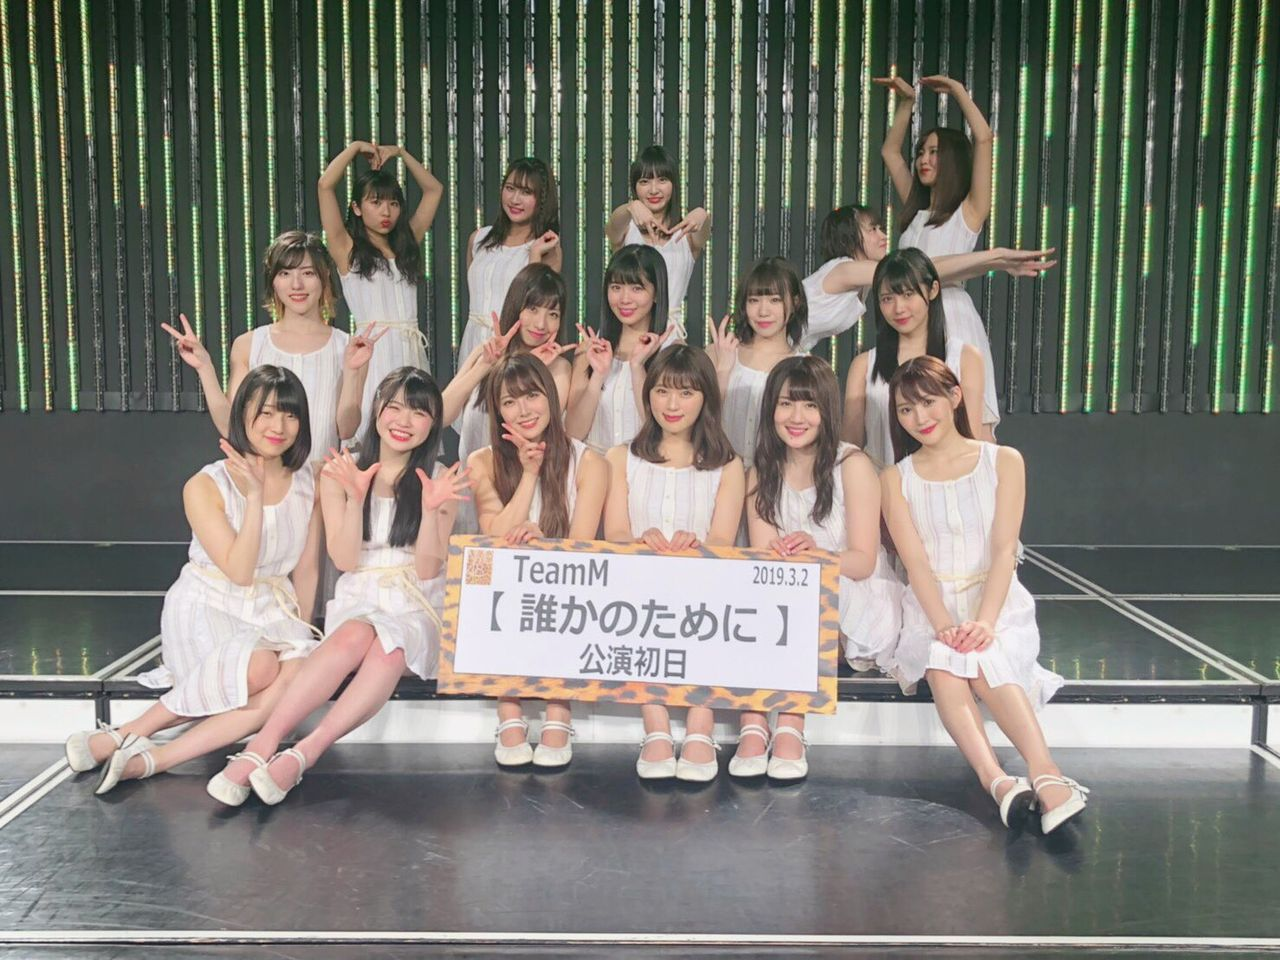 【NMB48】渋谷チームM集合写真